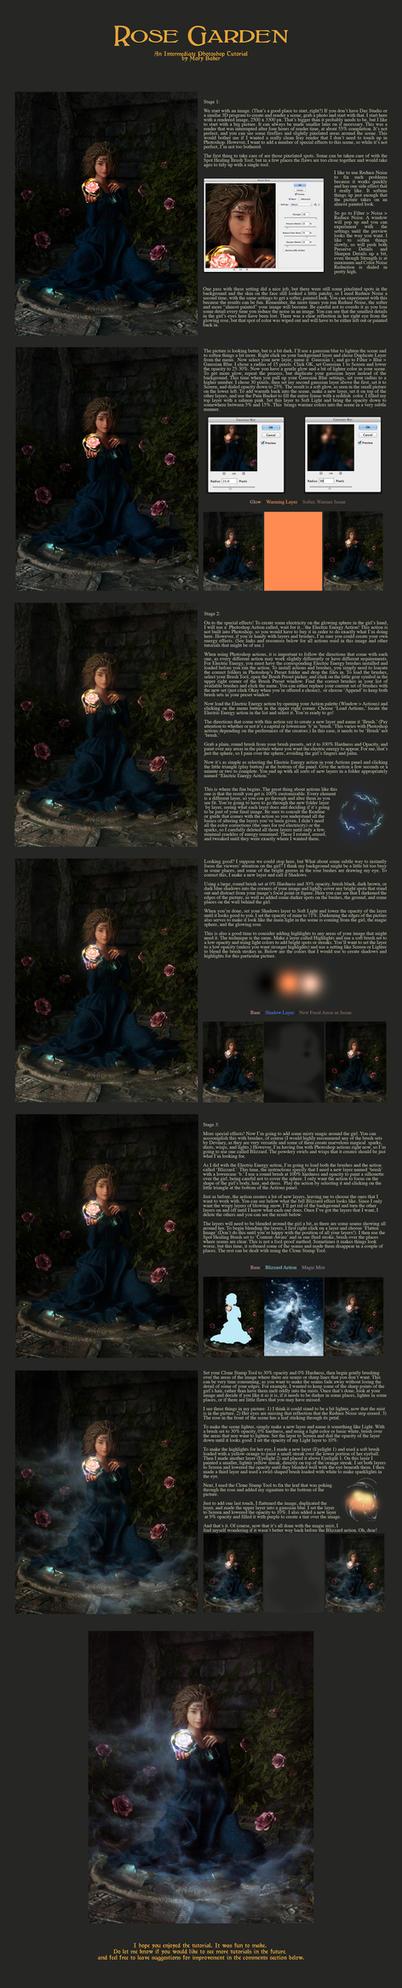 Rose Garden: An Intermediate Photoshop Tutorial by LadyofTales